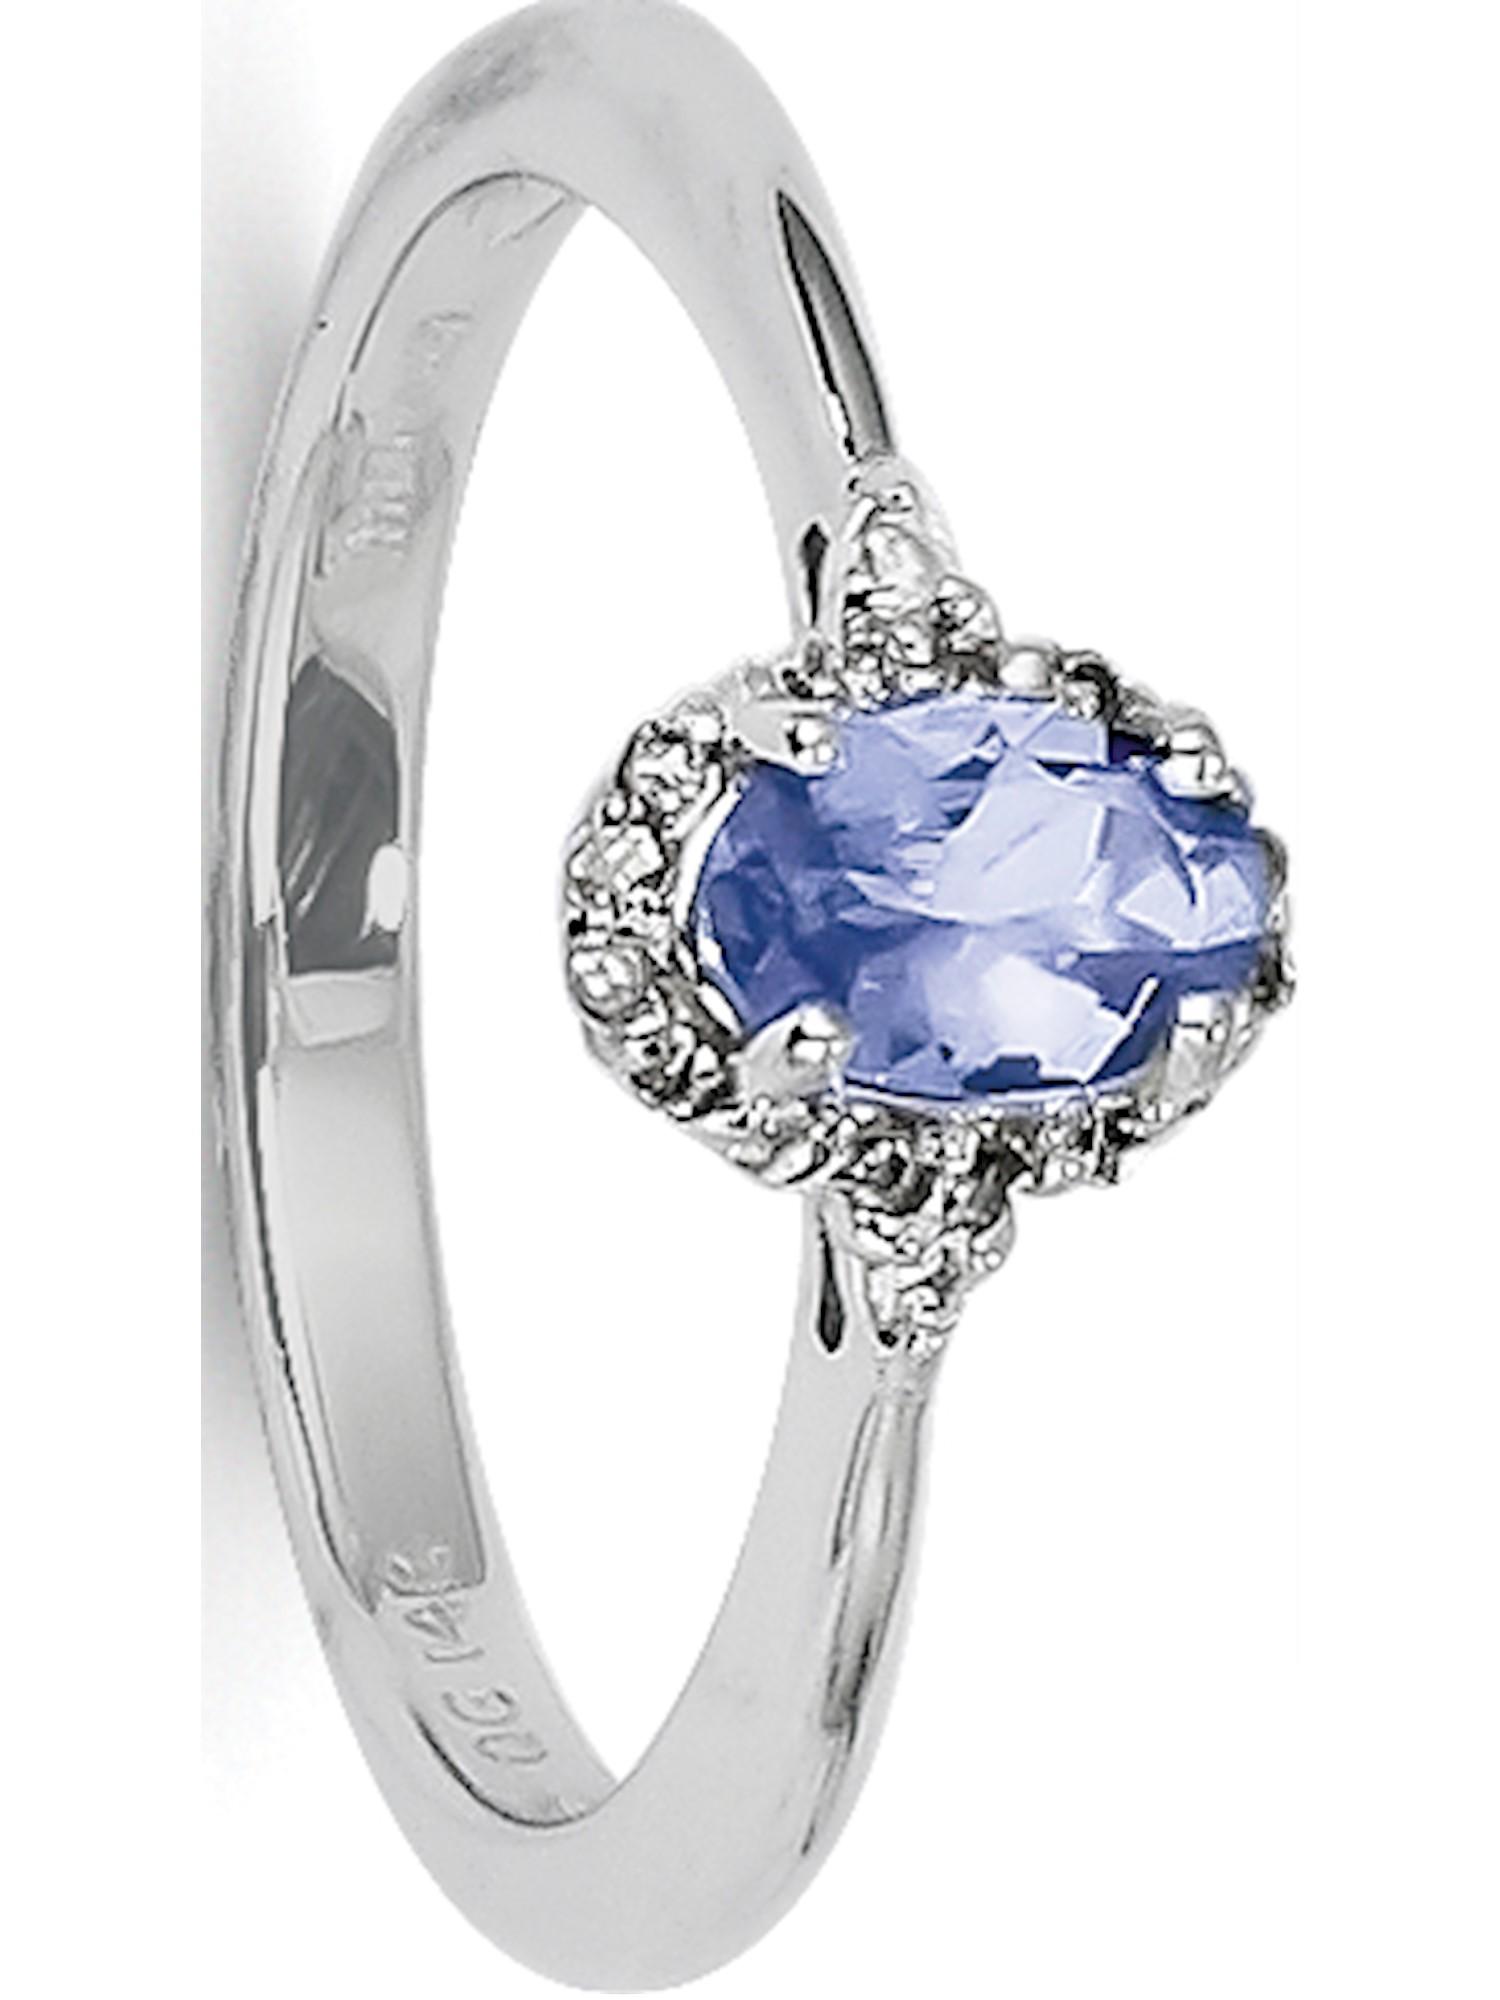 14k White Gold White Tanzanite and Diamond Ring by